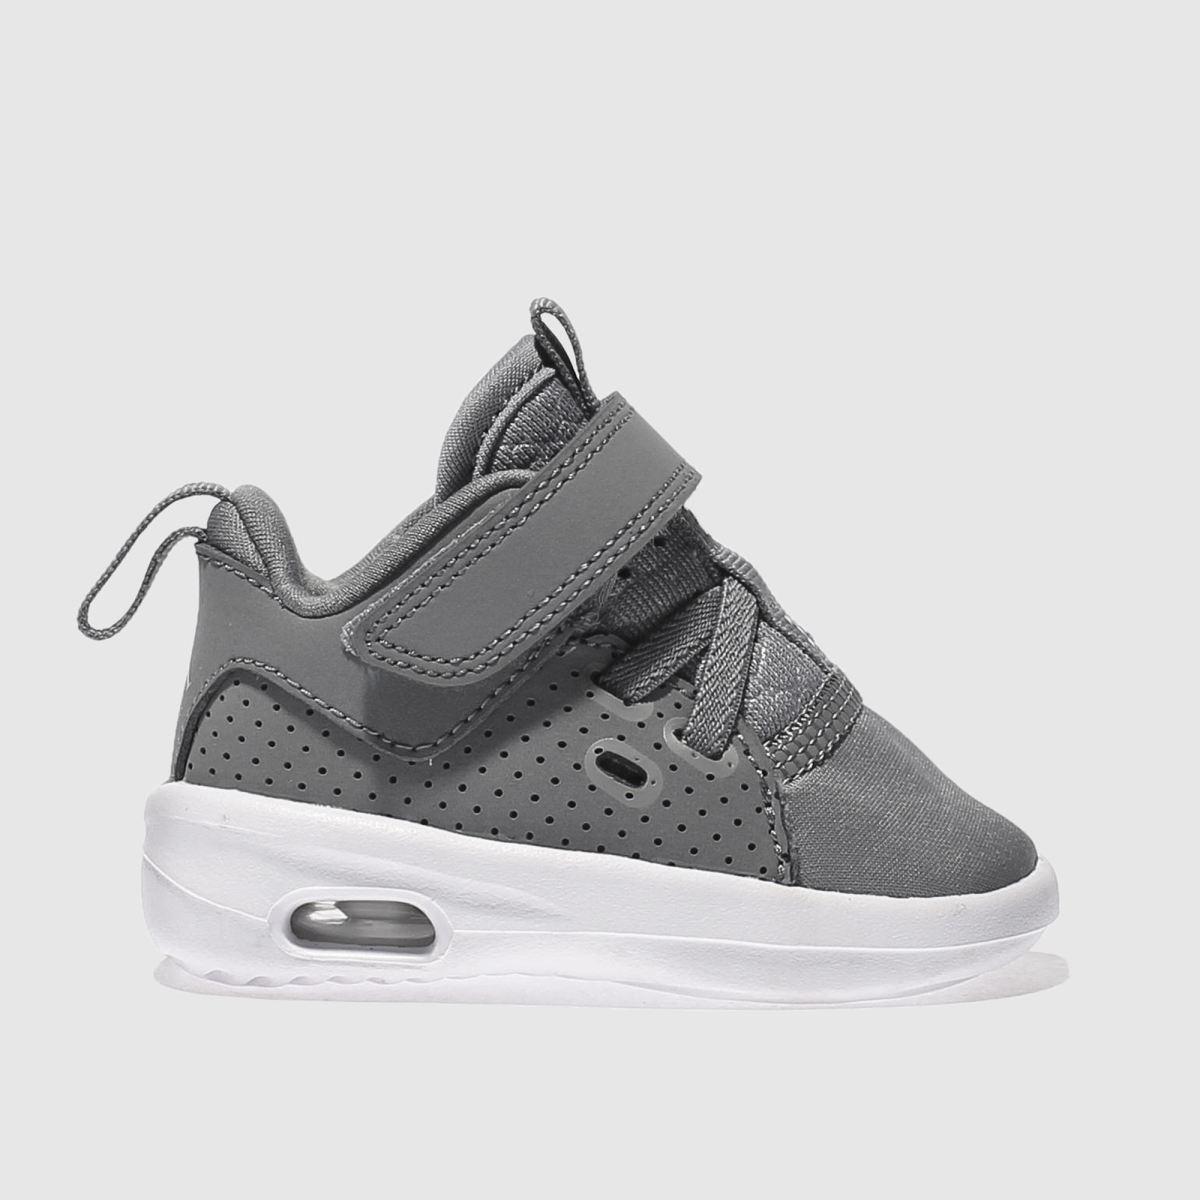 Nike Jordan Grey First Class Toddler Trainers